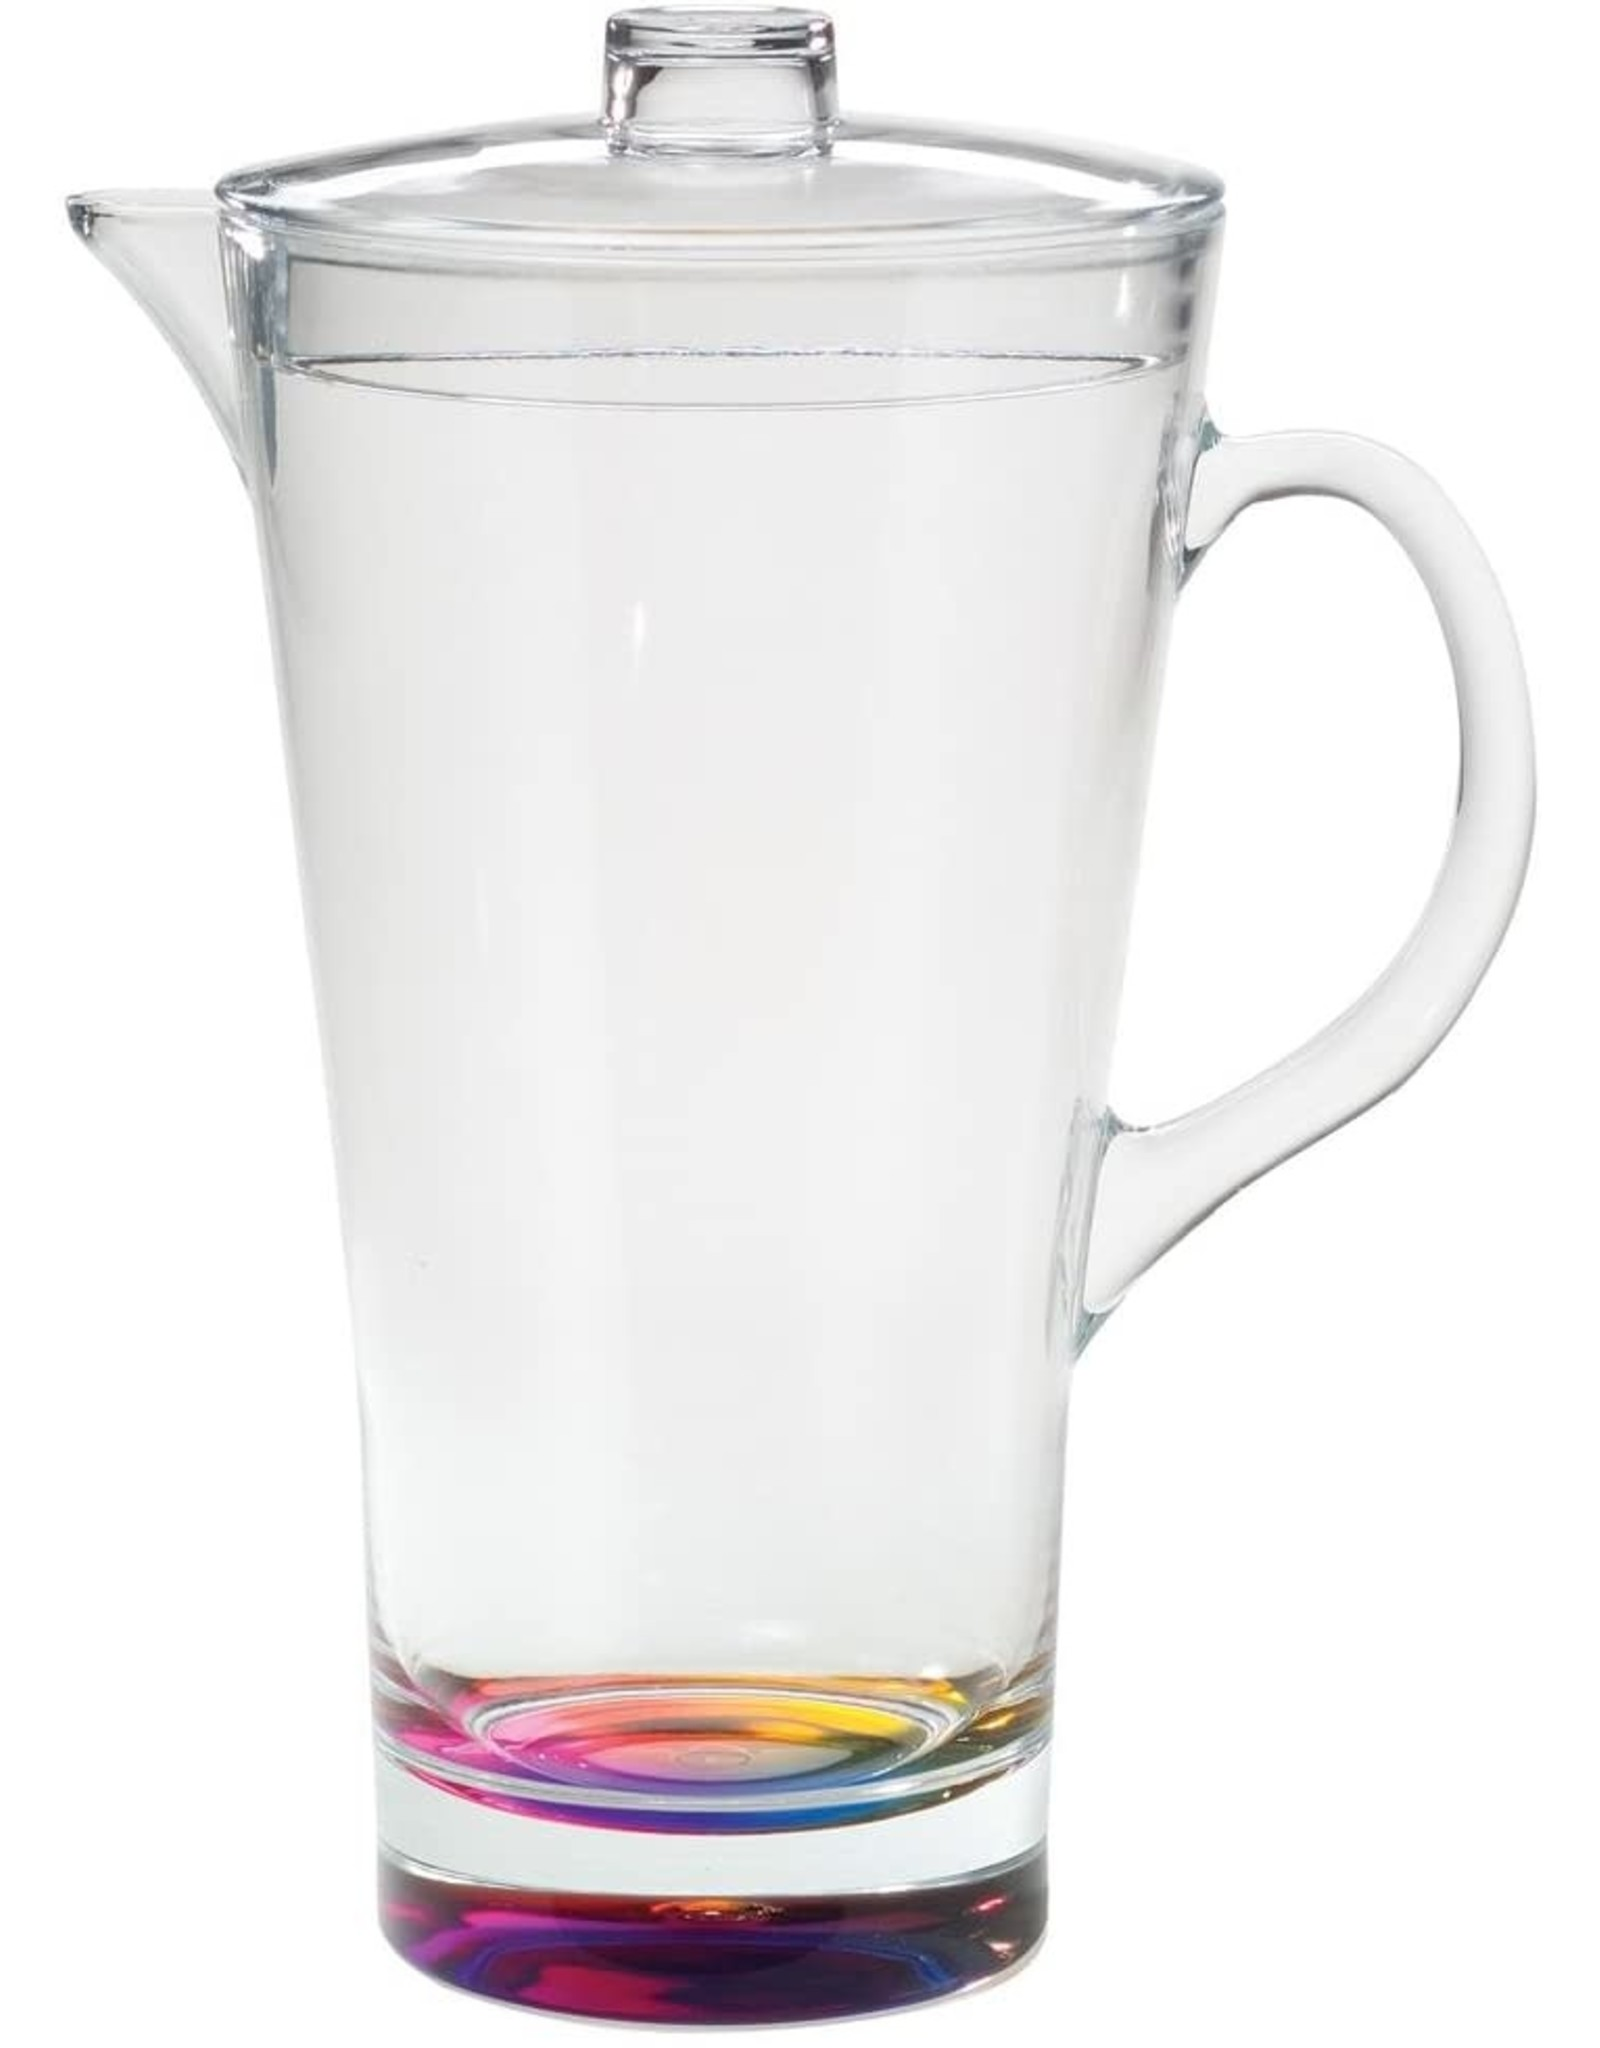 Merritt International Acrylic Rainbow Crystal Pitcher 2 Quart